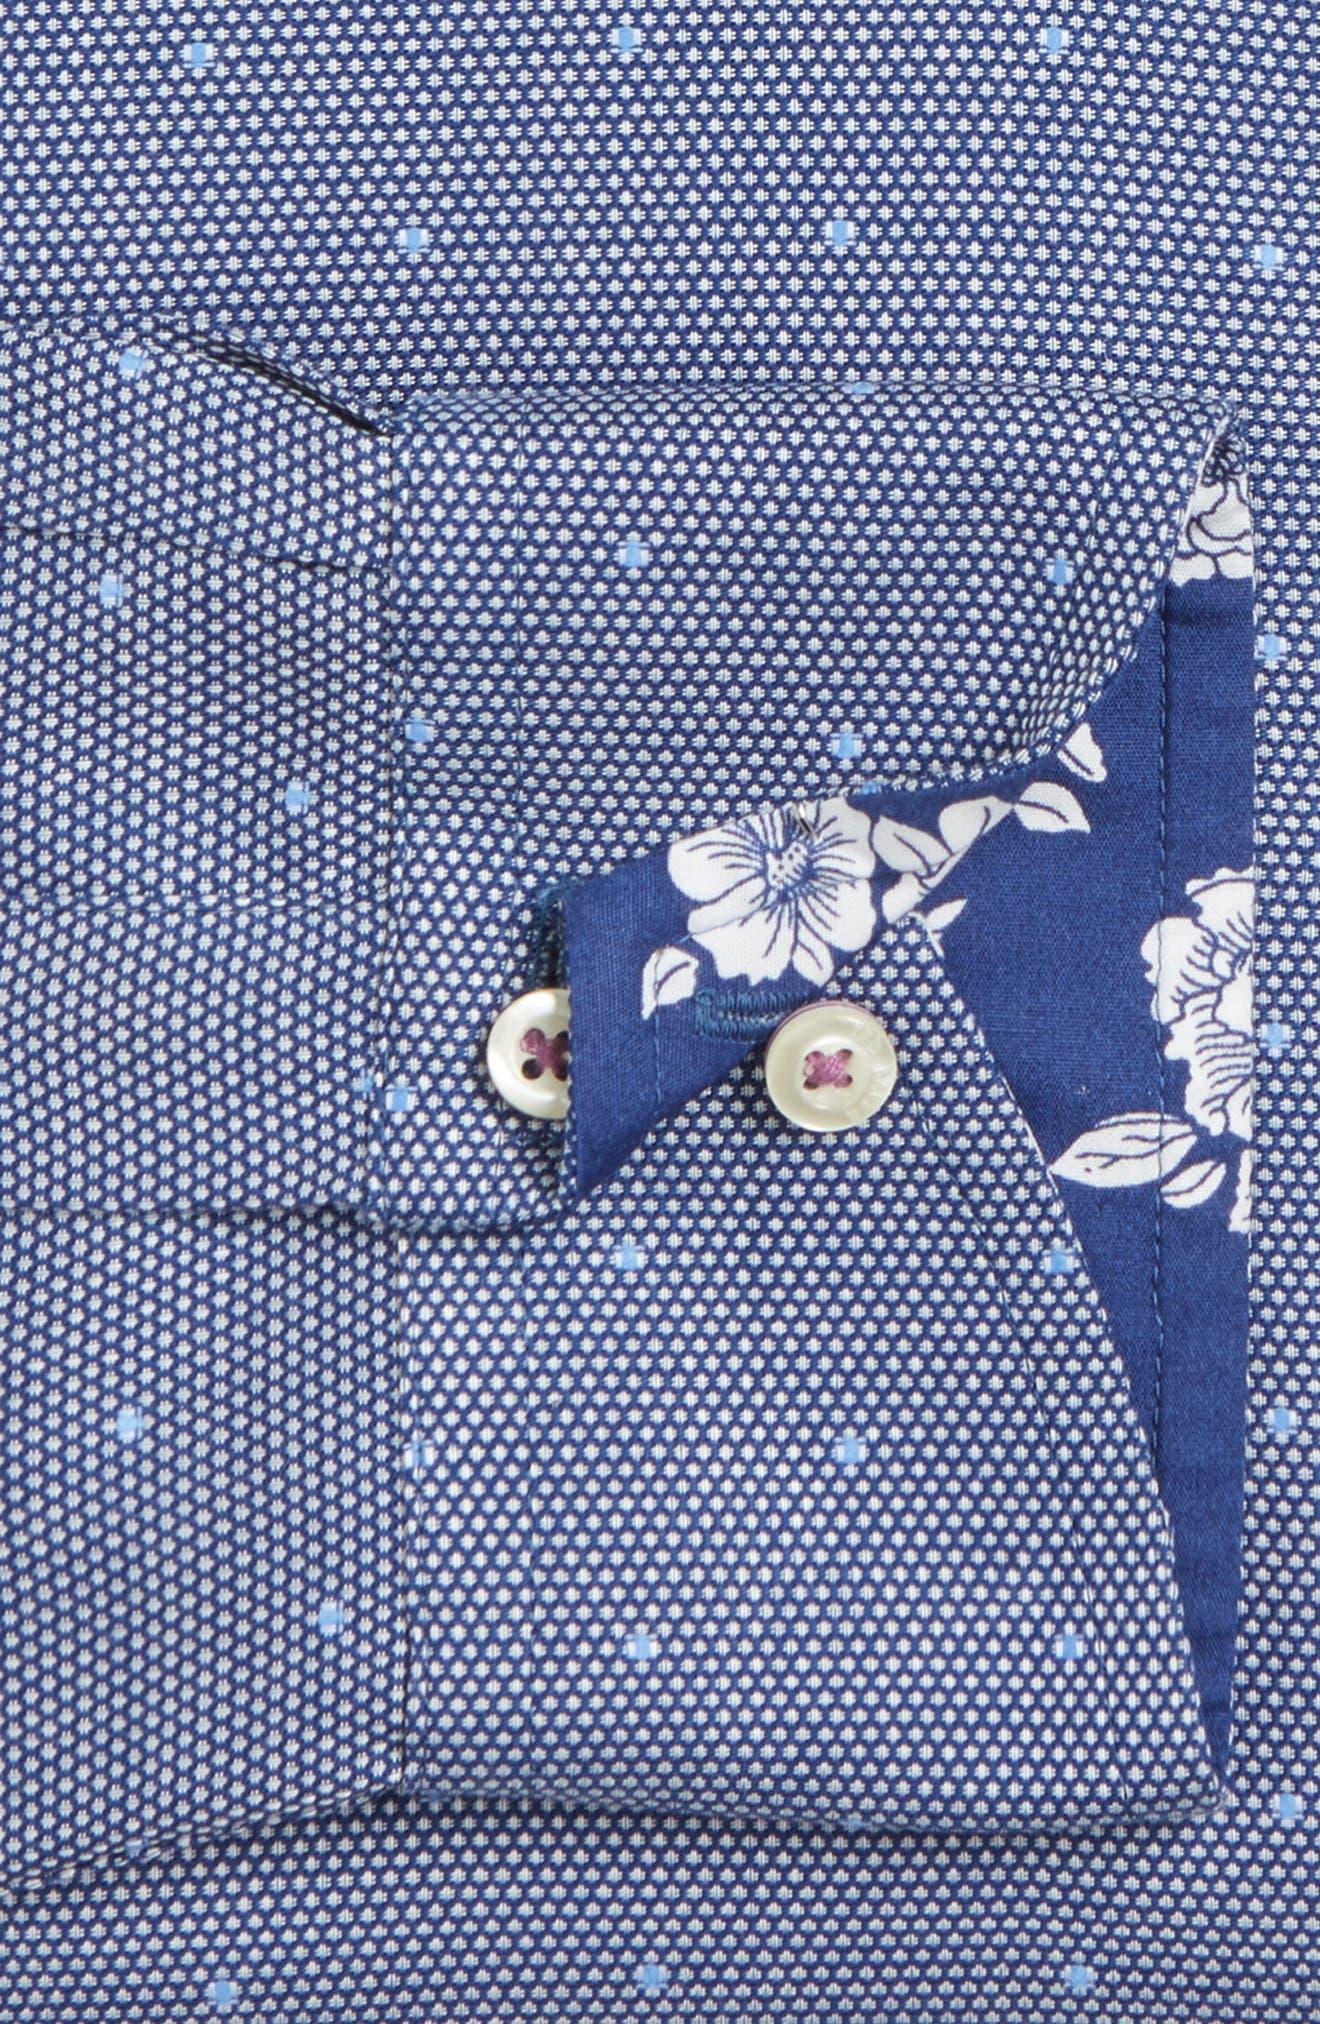 Trim Fit Dot Dress Shirt,                             Alternate thumbnail 4, color,                             410